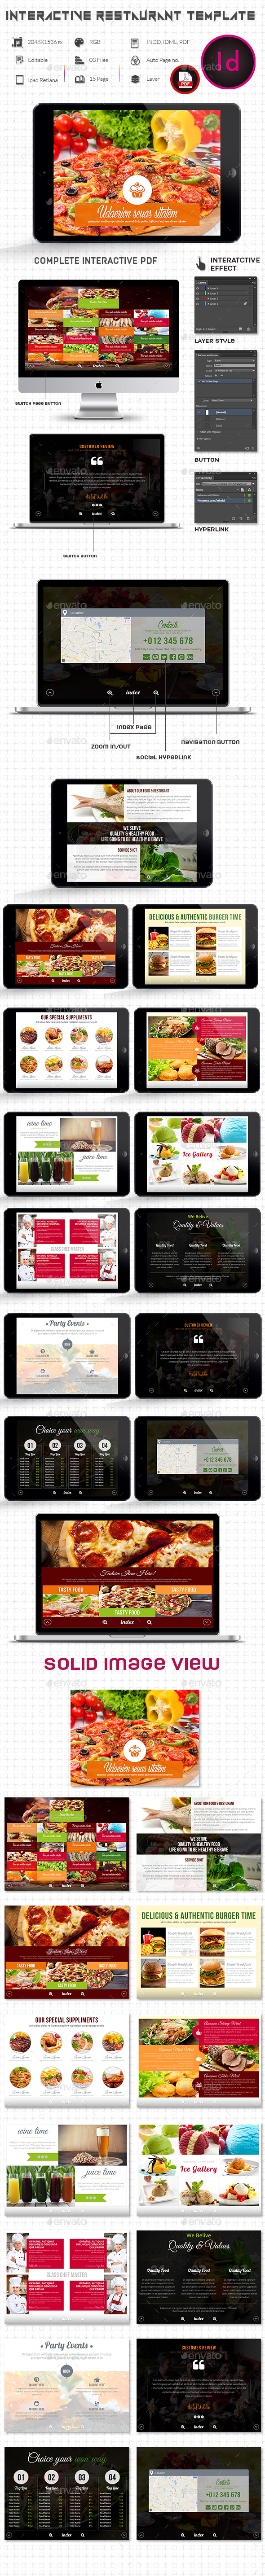 Interactive Restaurant Template  - ePublishing